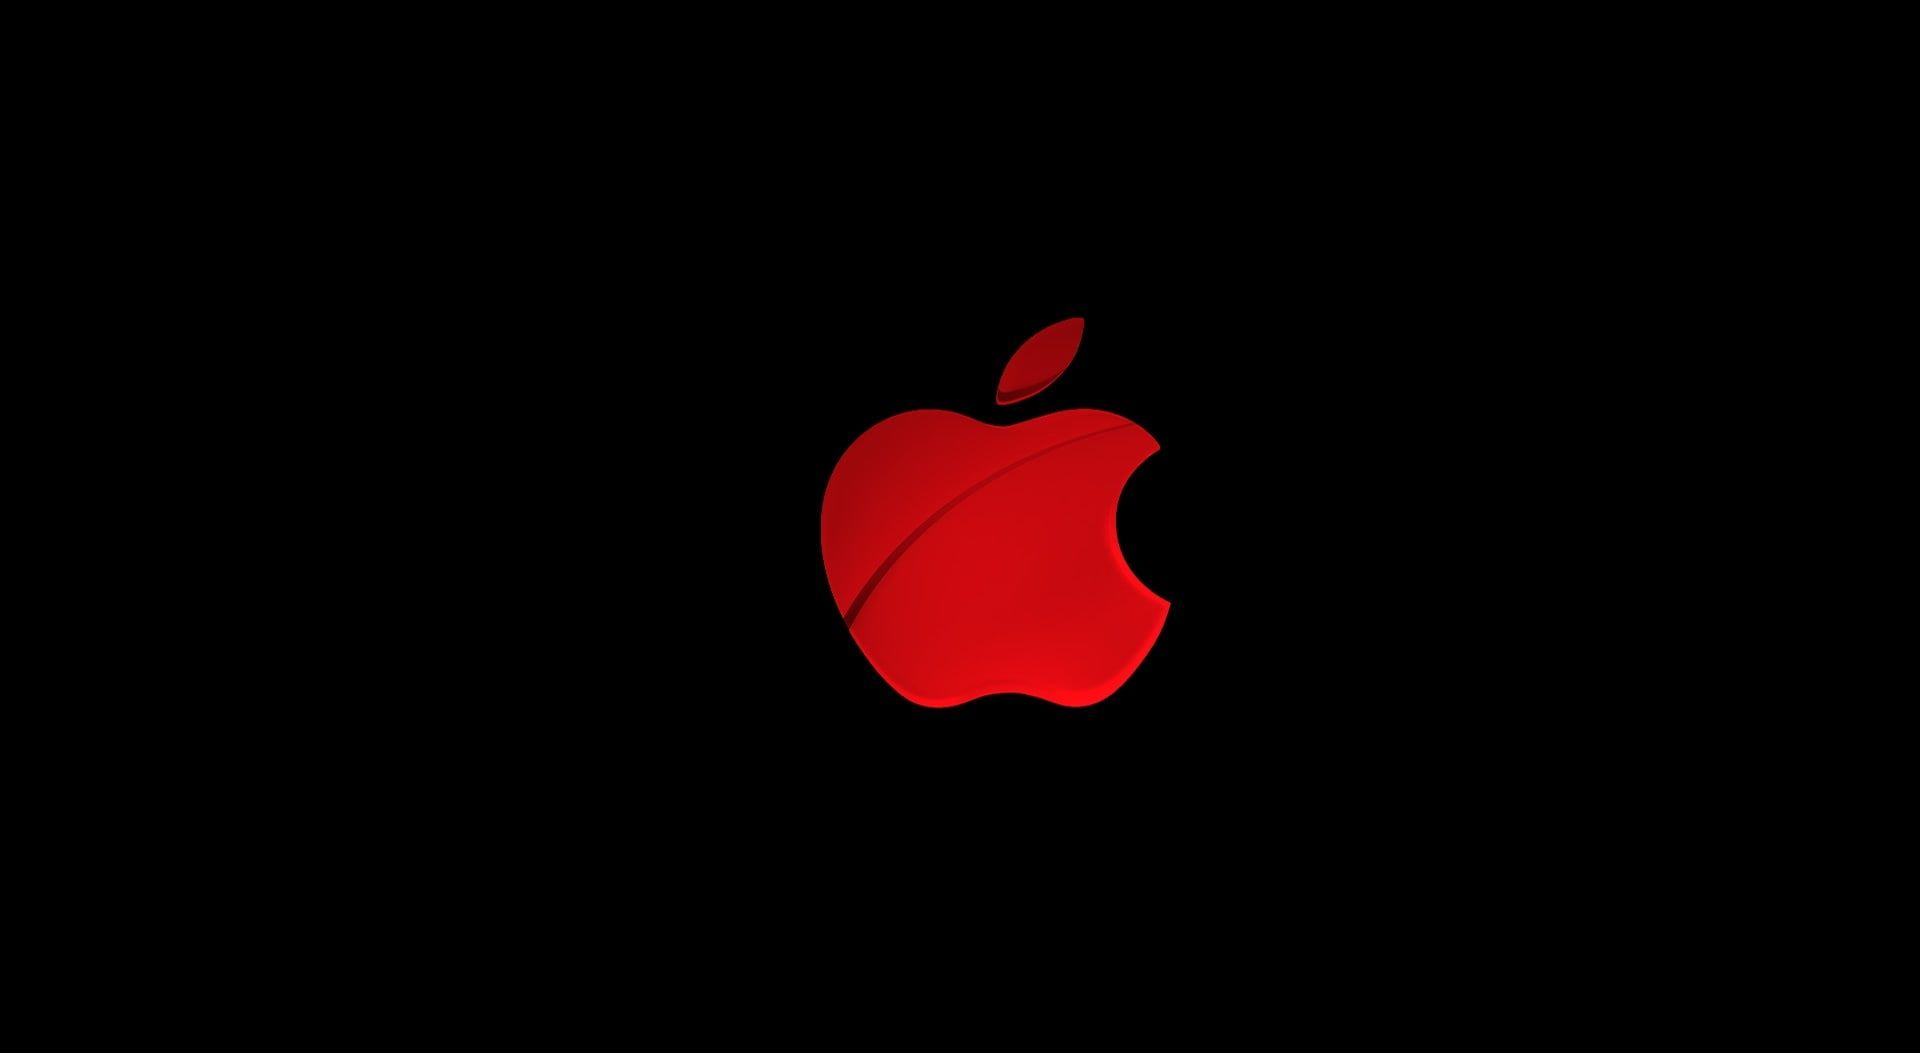 Apple Red Apple Logo Computers Mac Black 1080p Wallpaper Hdwallpaper Desktop Red Apple Apple Logo Wallpaper Apple Logo